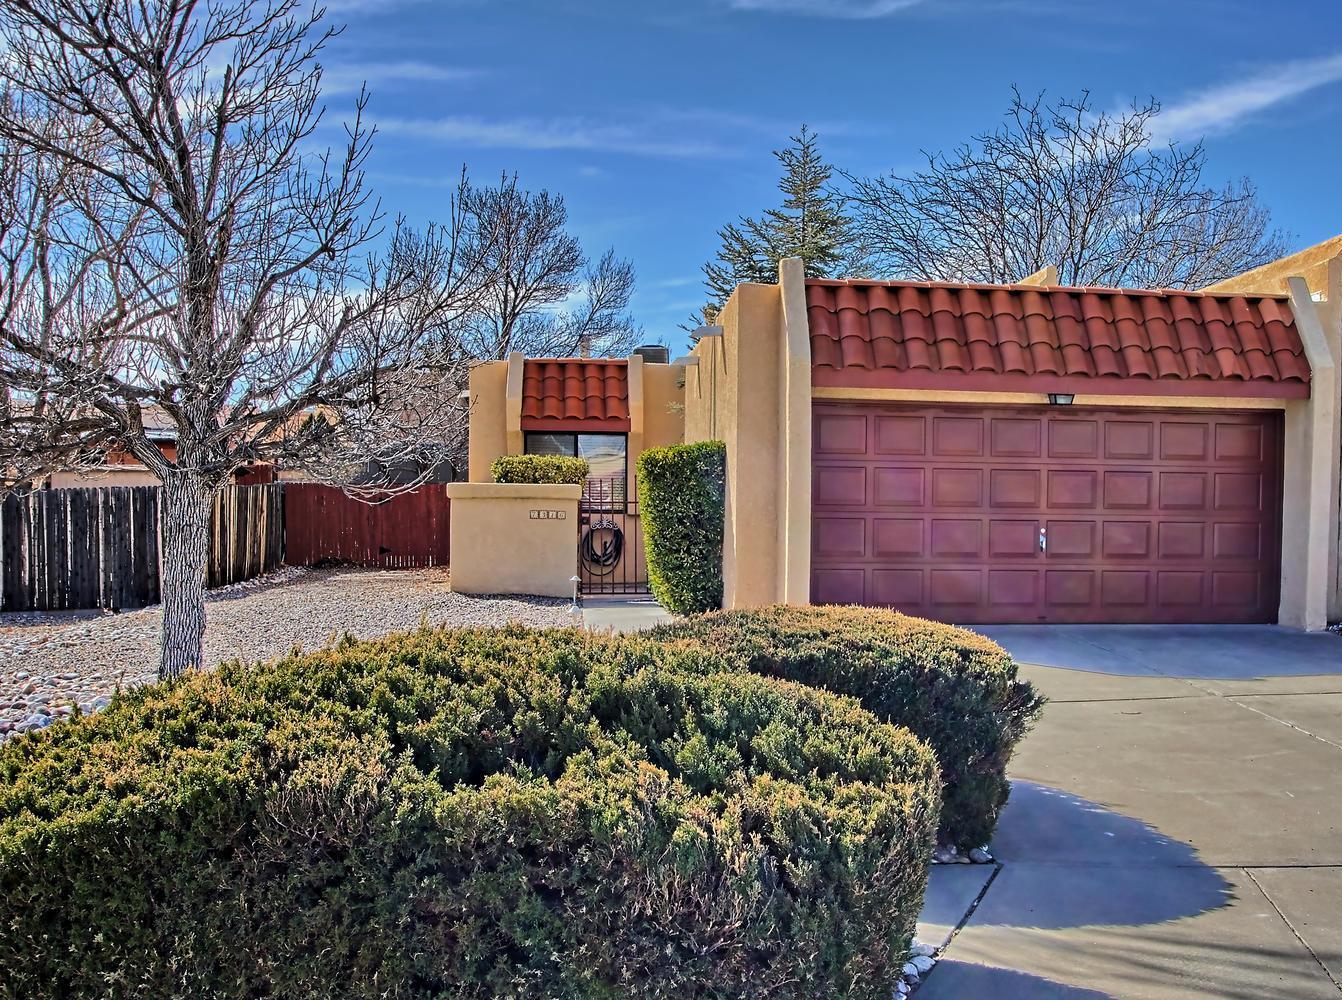 7316 NW Prenda de Plata, Northwest Albuquerque and Northwest Heights, New Mexico